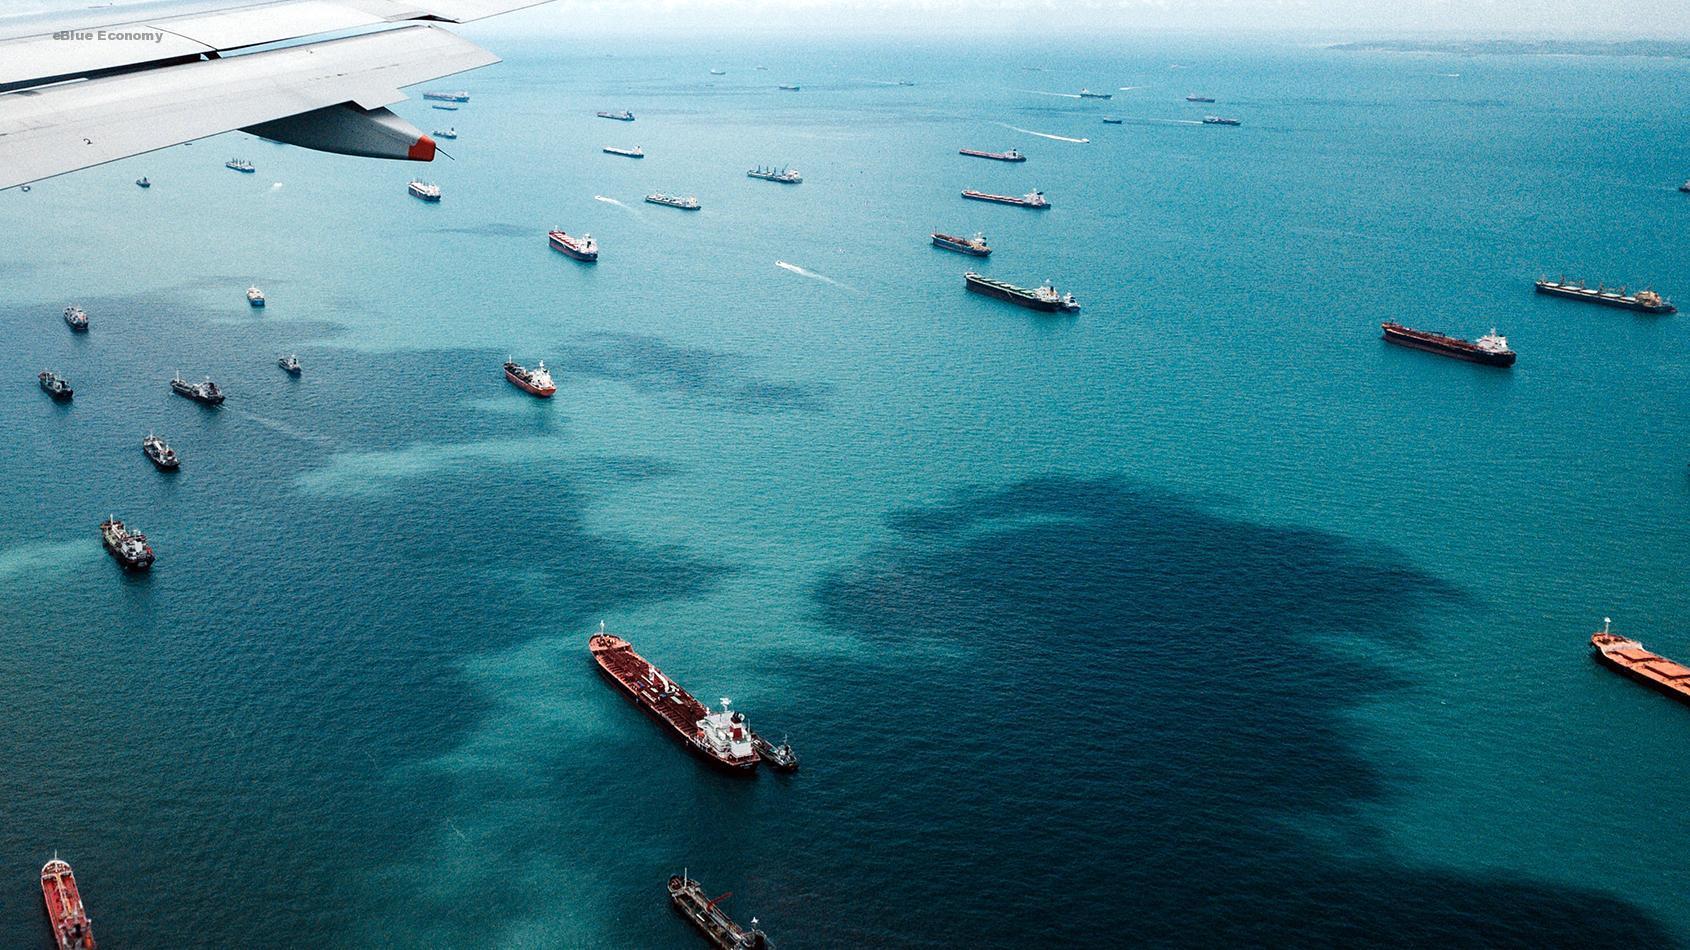 eBlue_economy_The International Bargaining Forum concludes negotiations, recognizing seafarers' Covid sacrifice